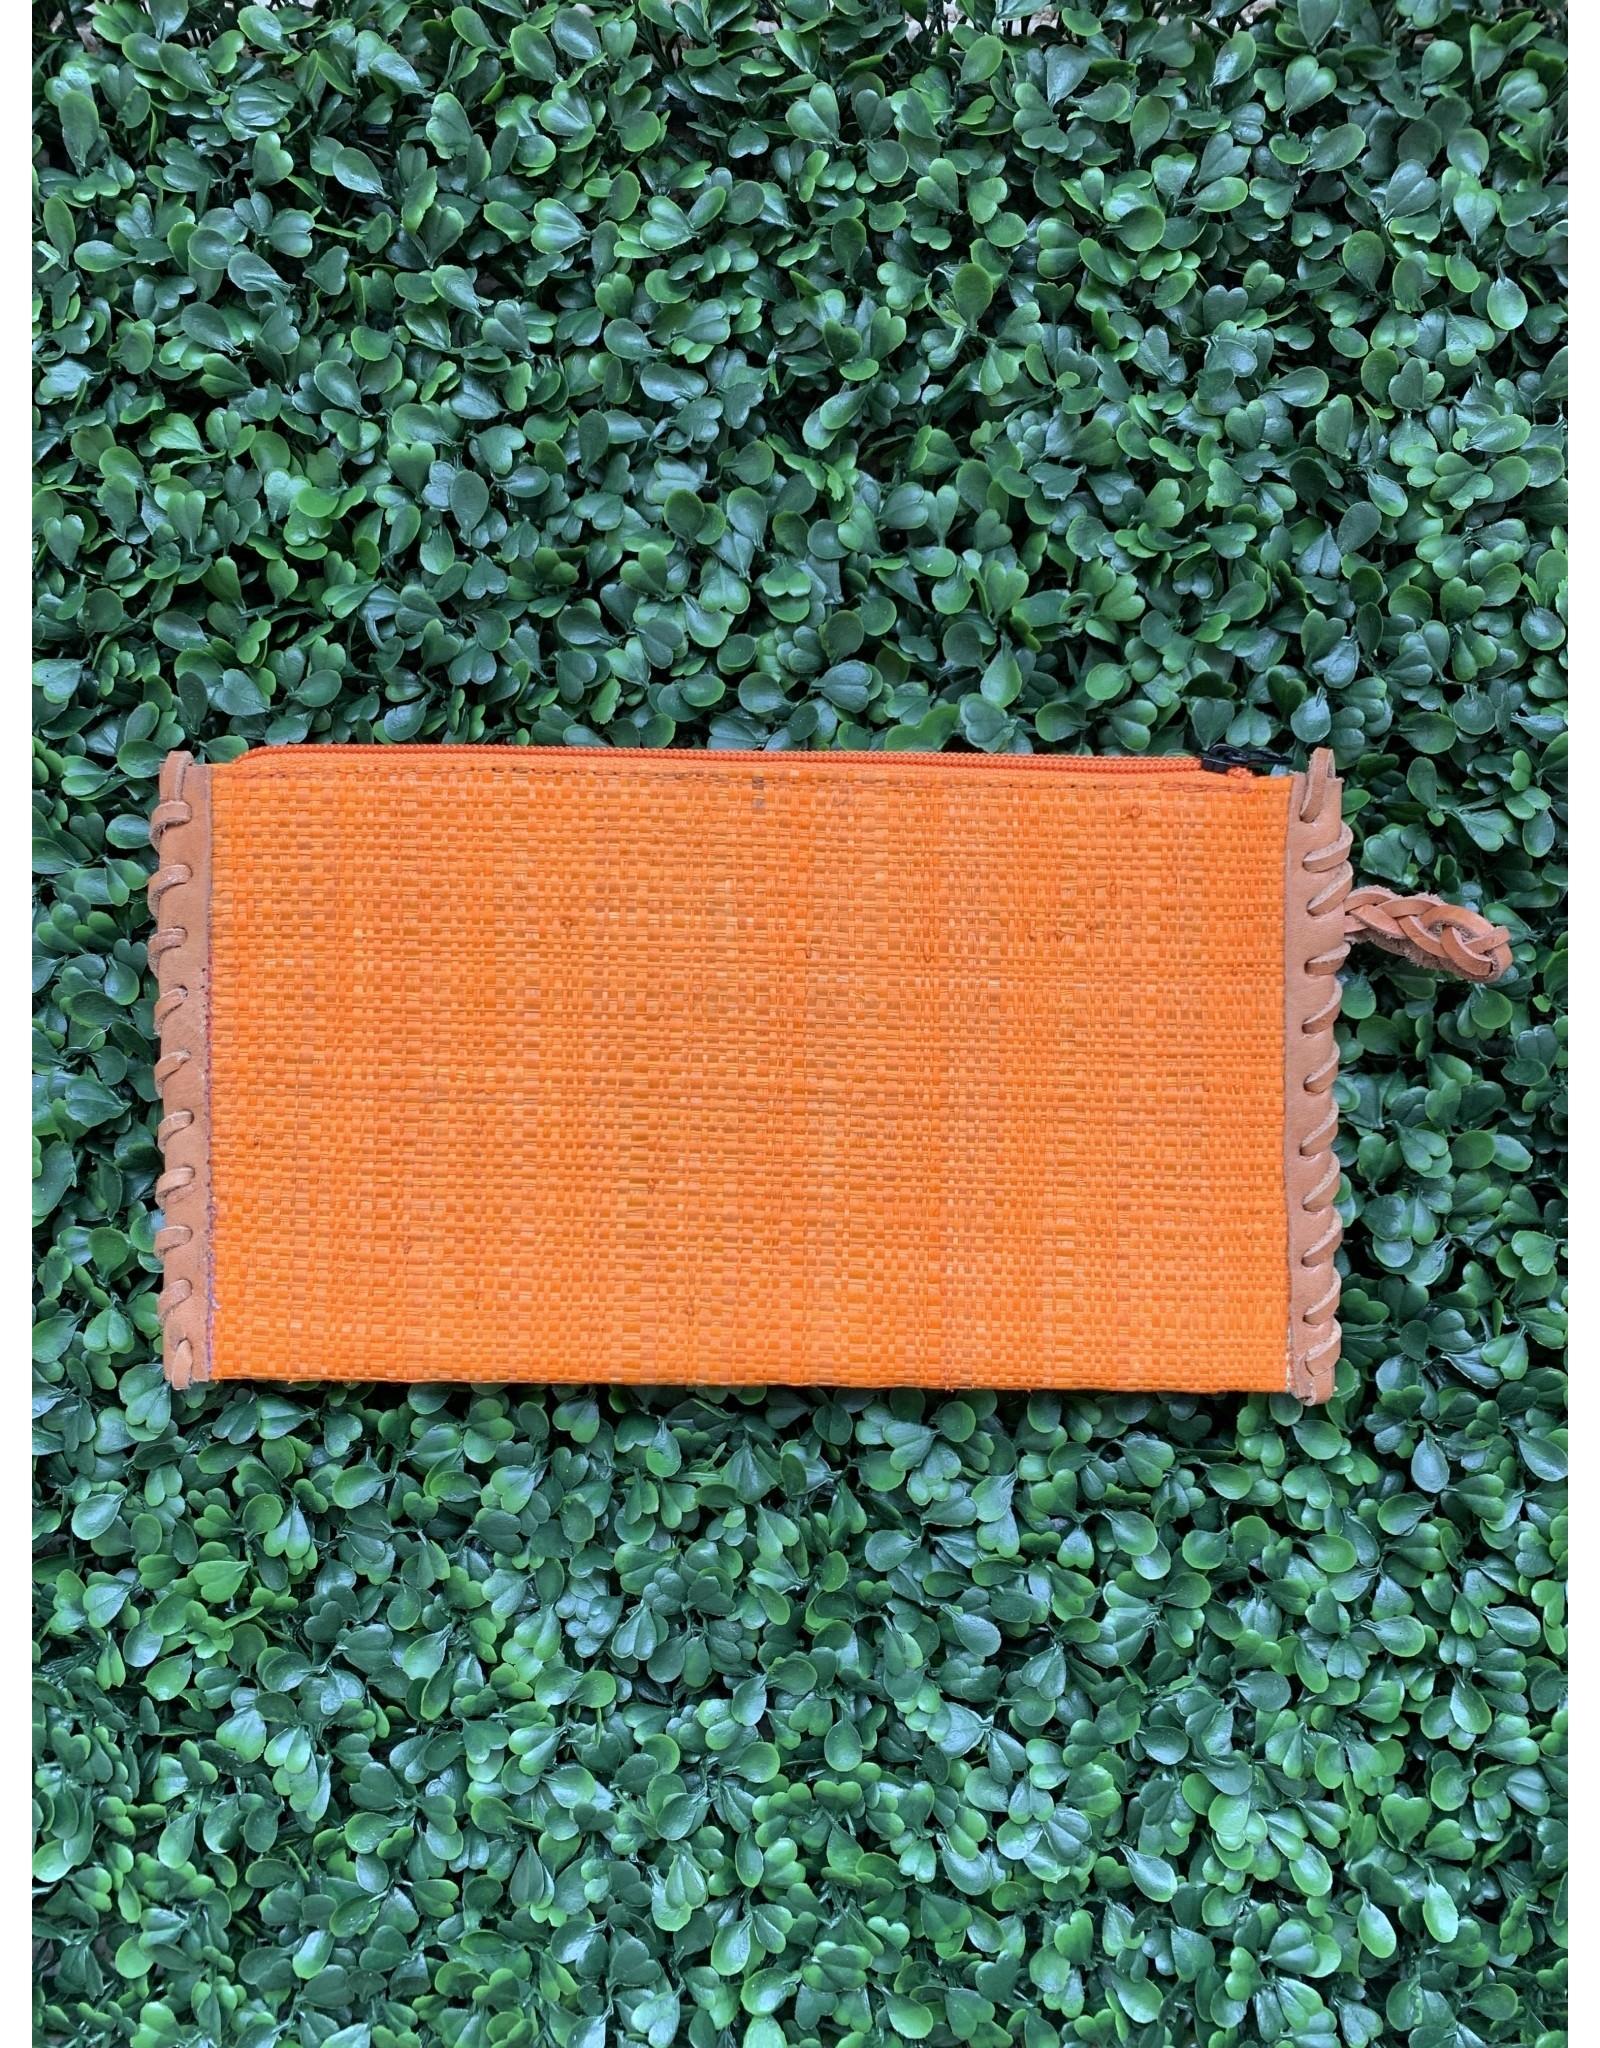 Zip Clutch Braided Handle in Tangerine